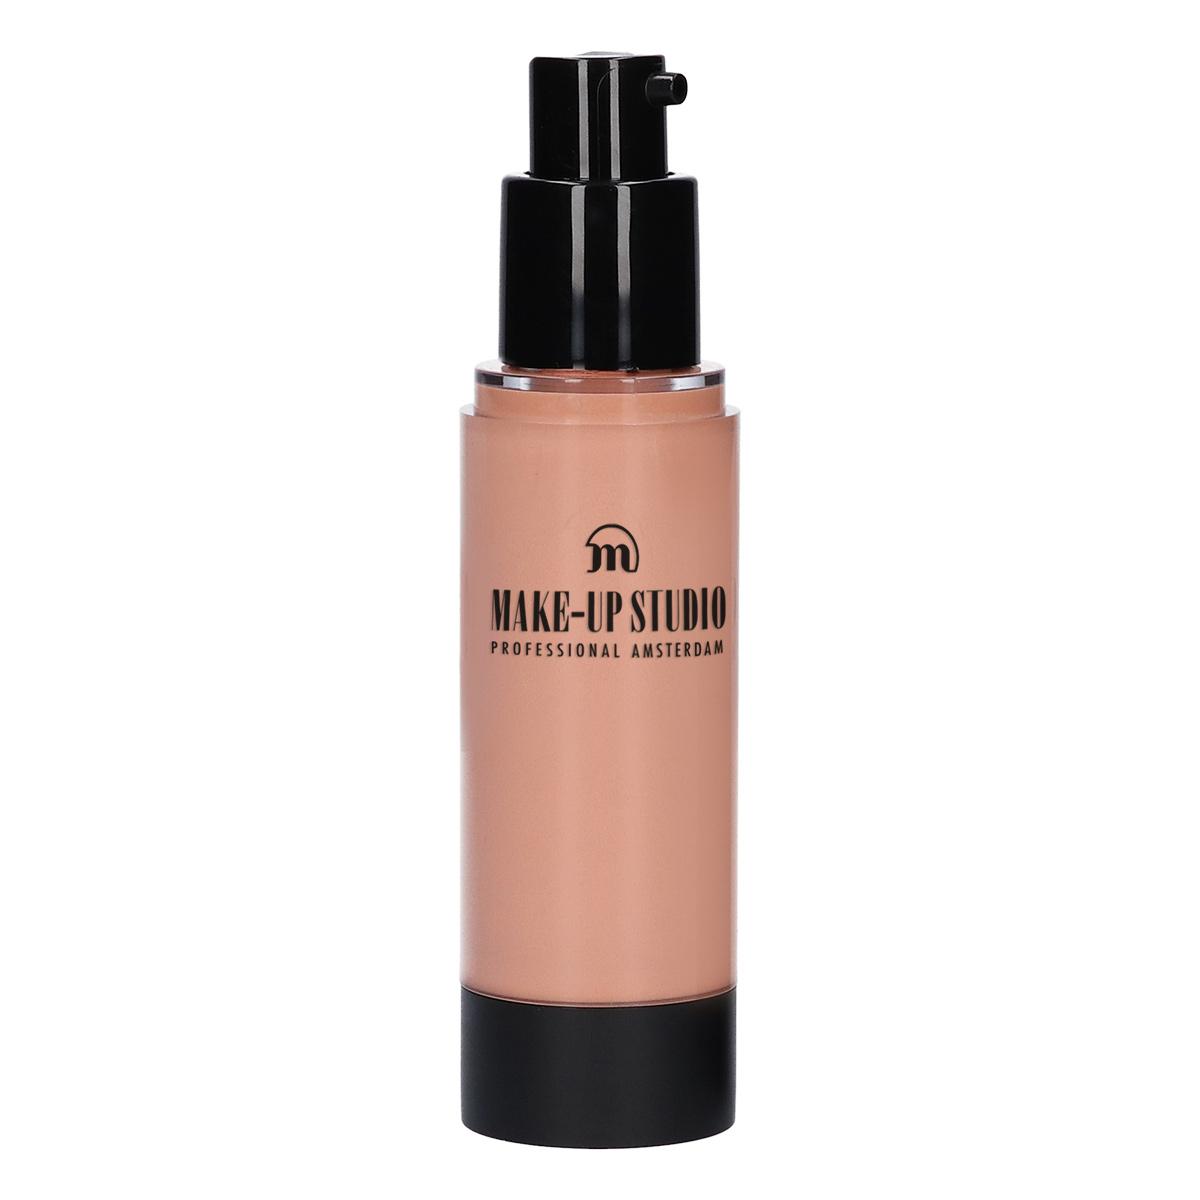 Fluid Foundation No Transfer - Pale Rose